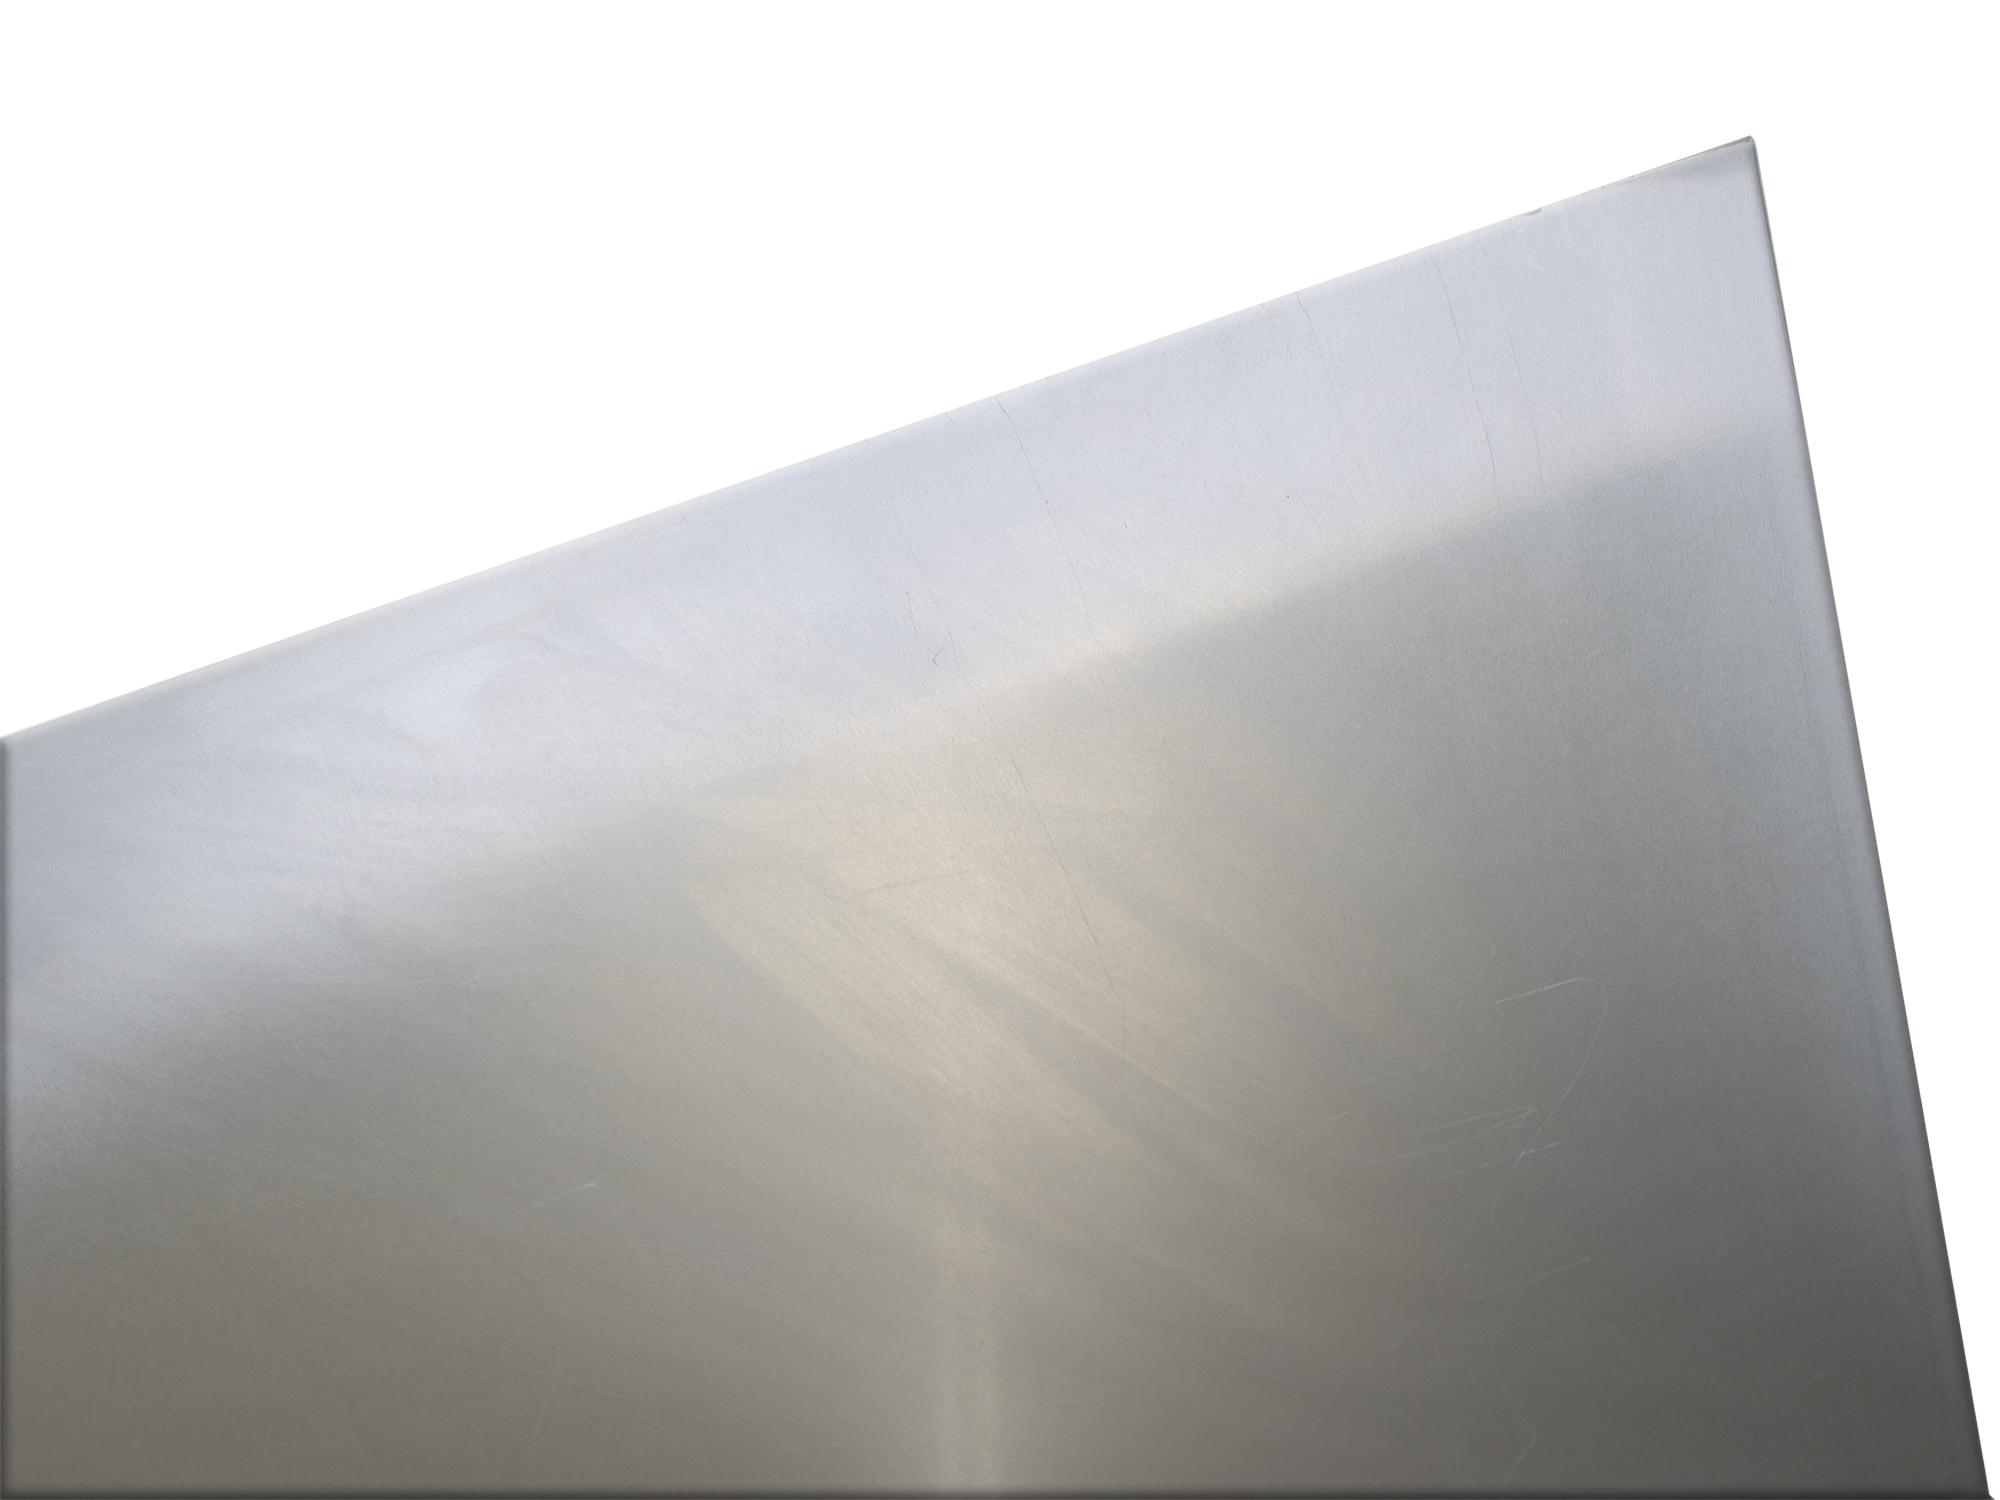 plaat aluminium 1000 x 500 x 2,0mm